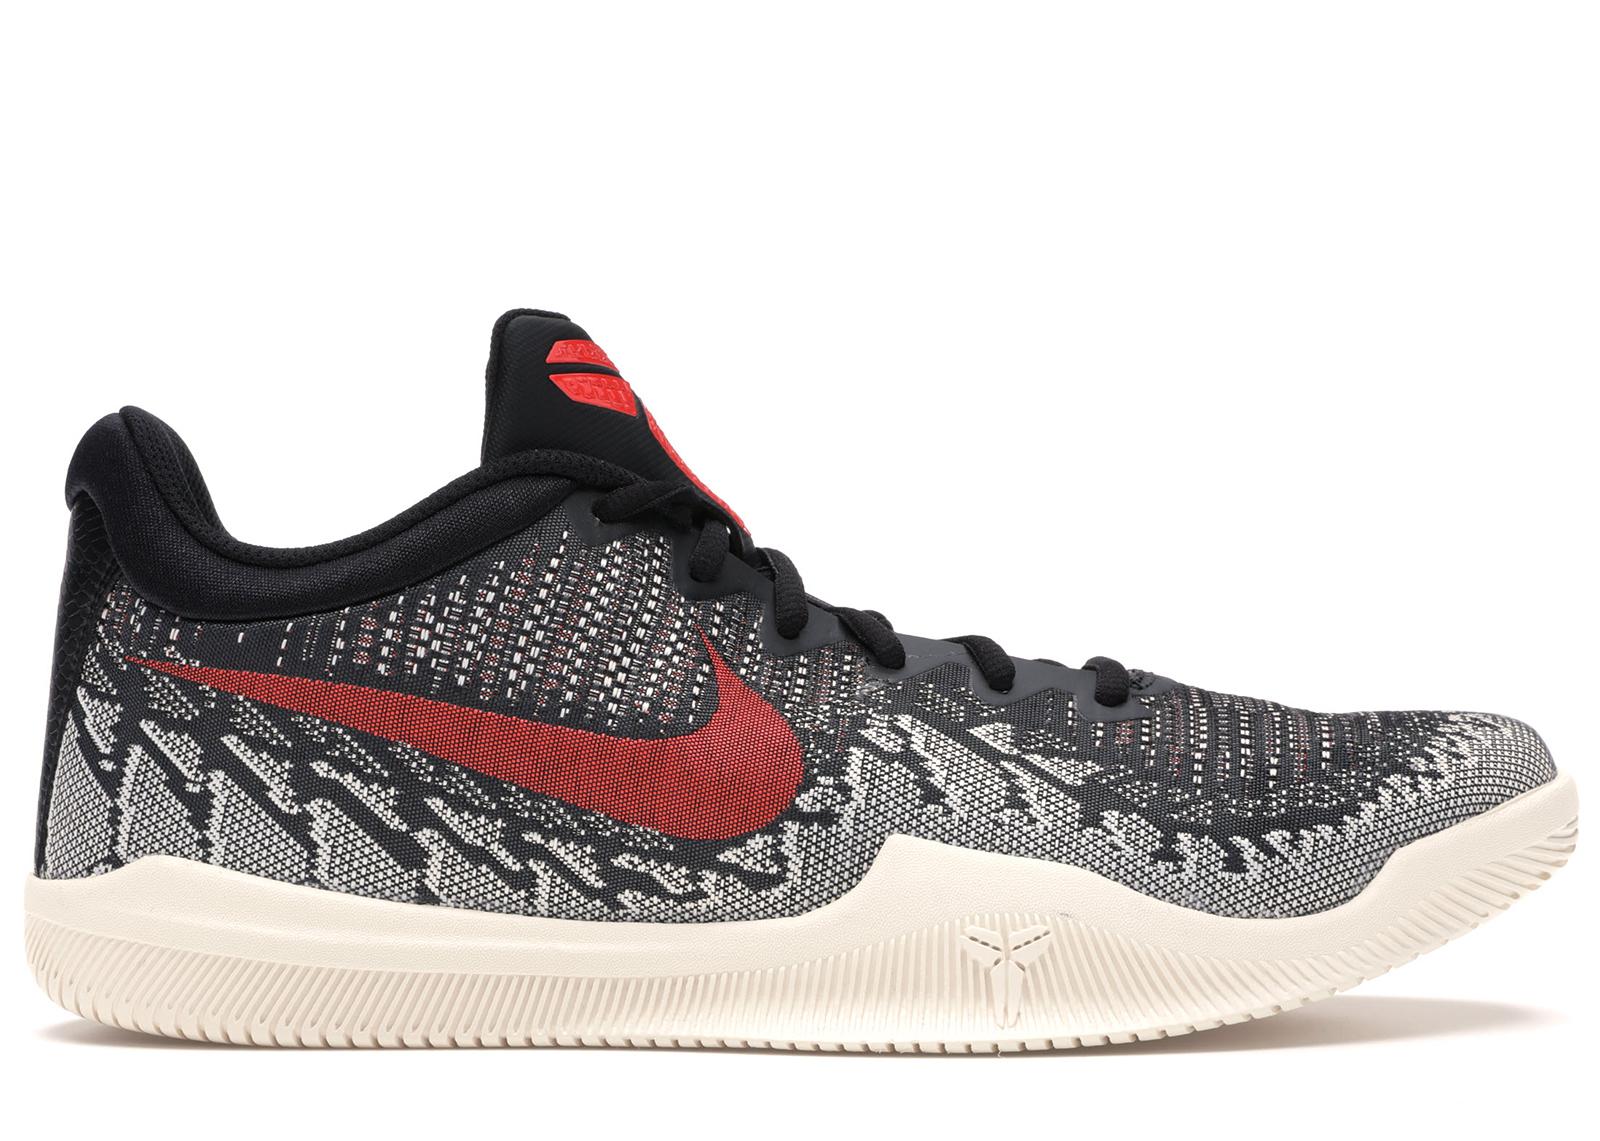 Nike Mamba Rage Black Crimson - 908972-060